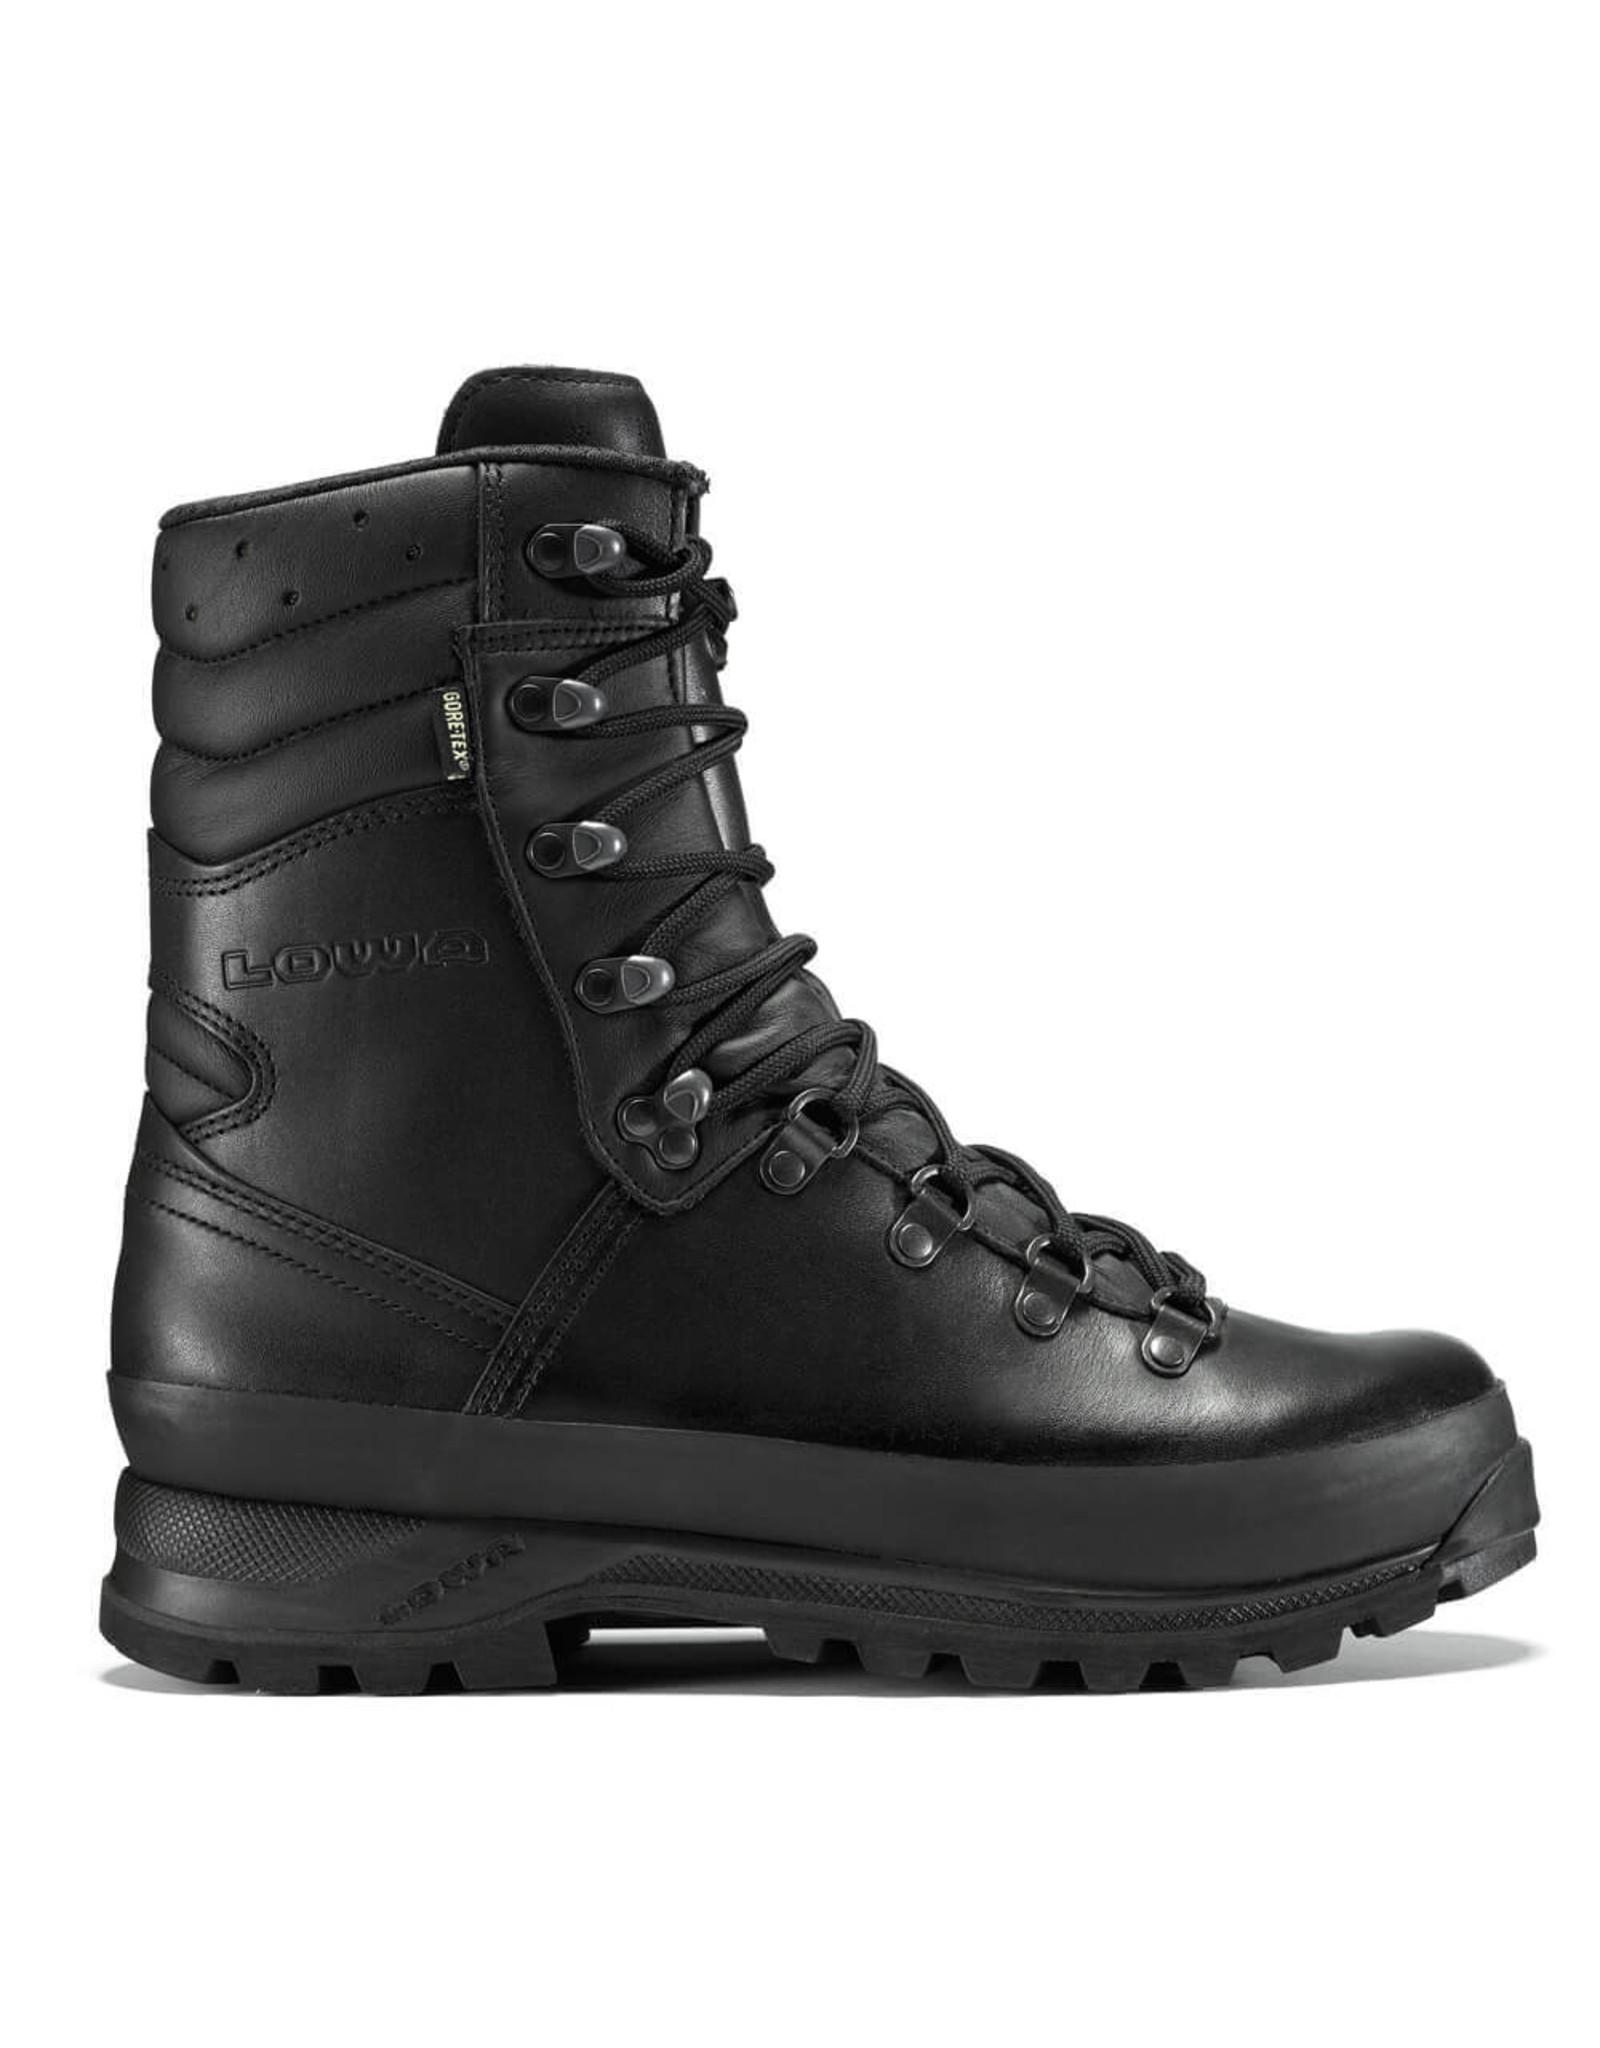 Lowa Lowa Tactical - M's - Combat Boot GTX -